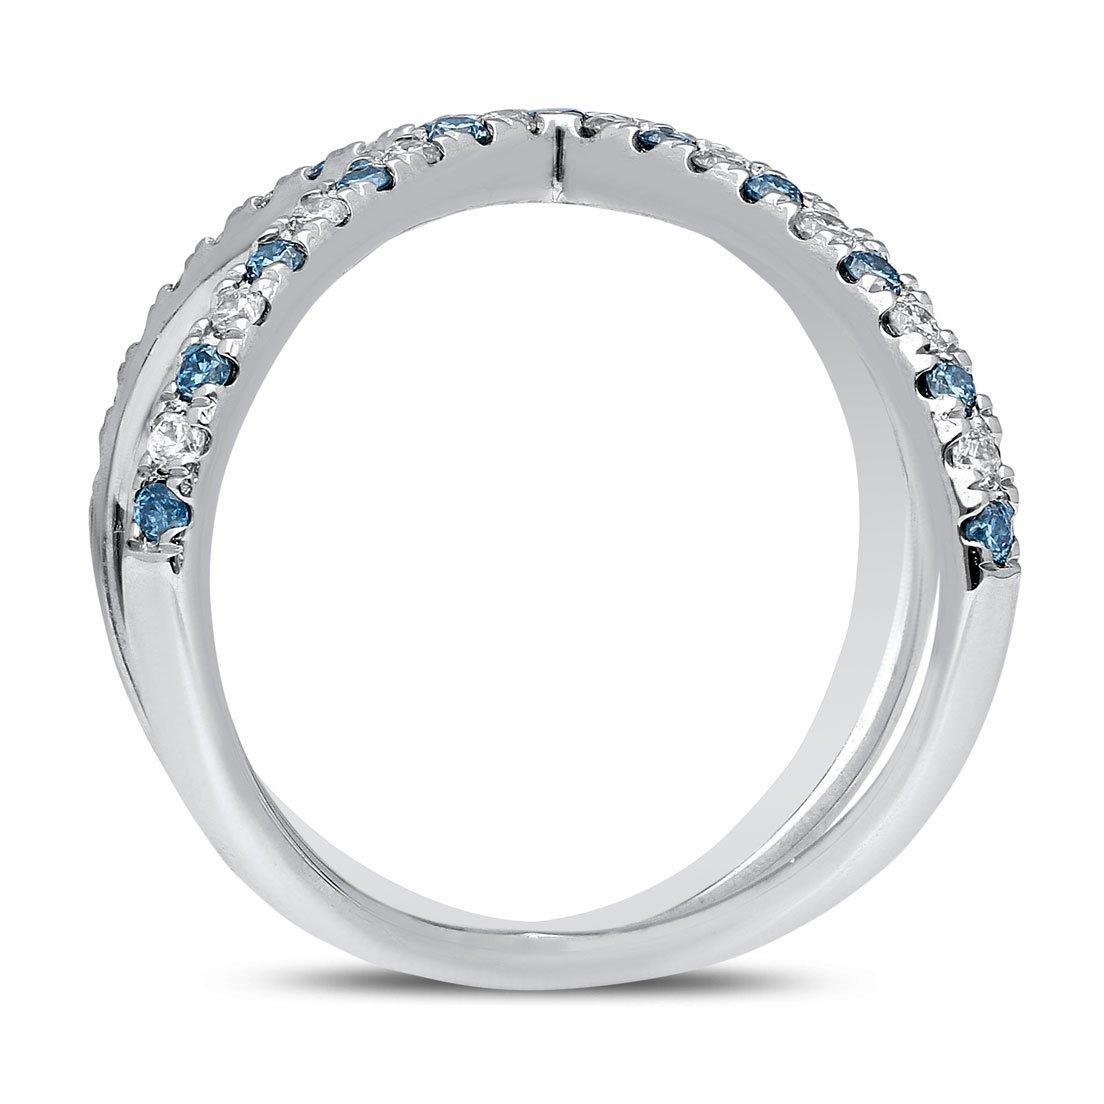 Blue Cosmos Diamond Ring In White Gold - madeinUSAdiamonds